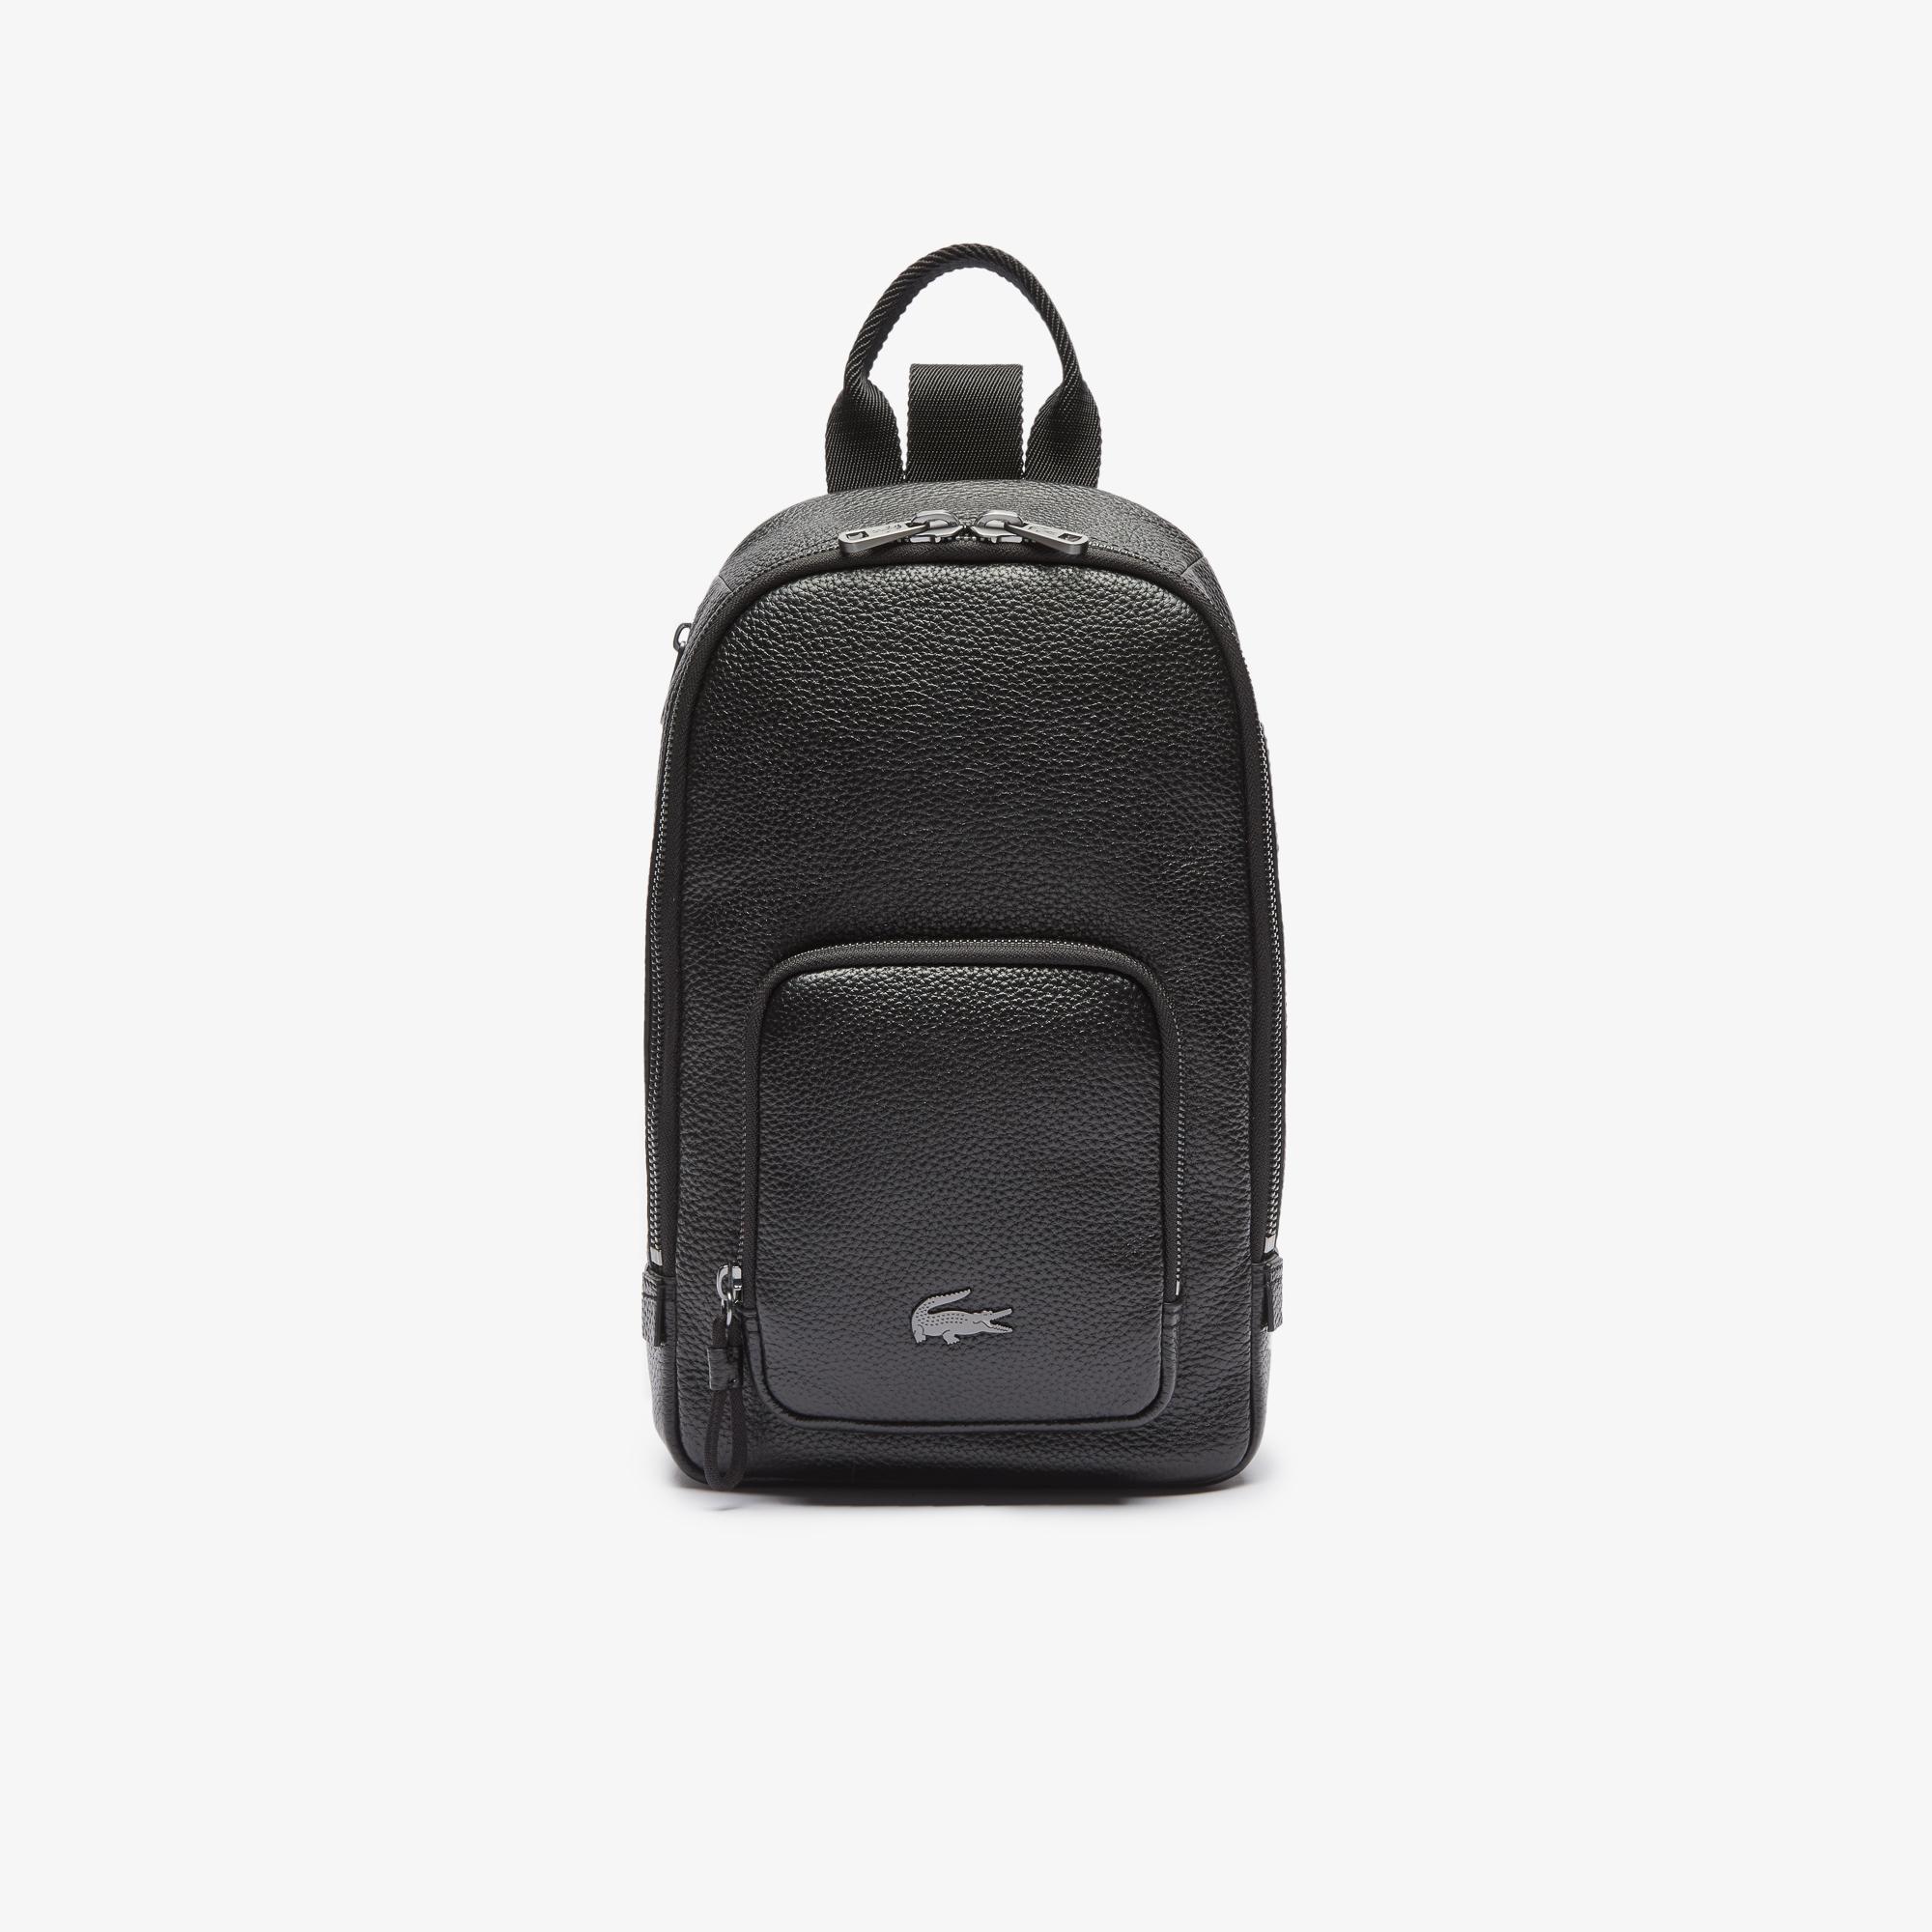 мужской рюкзак lacoste